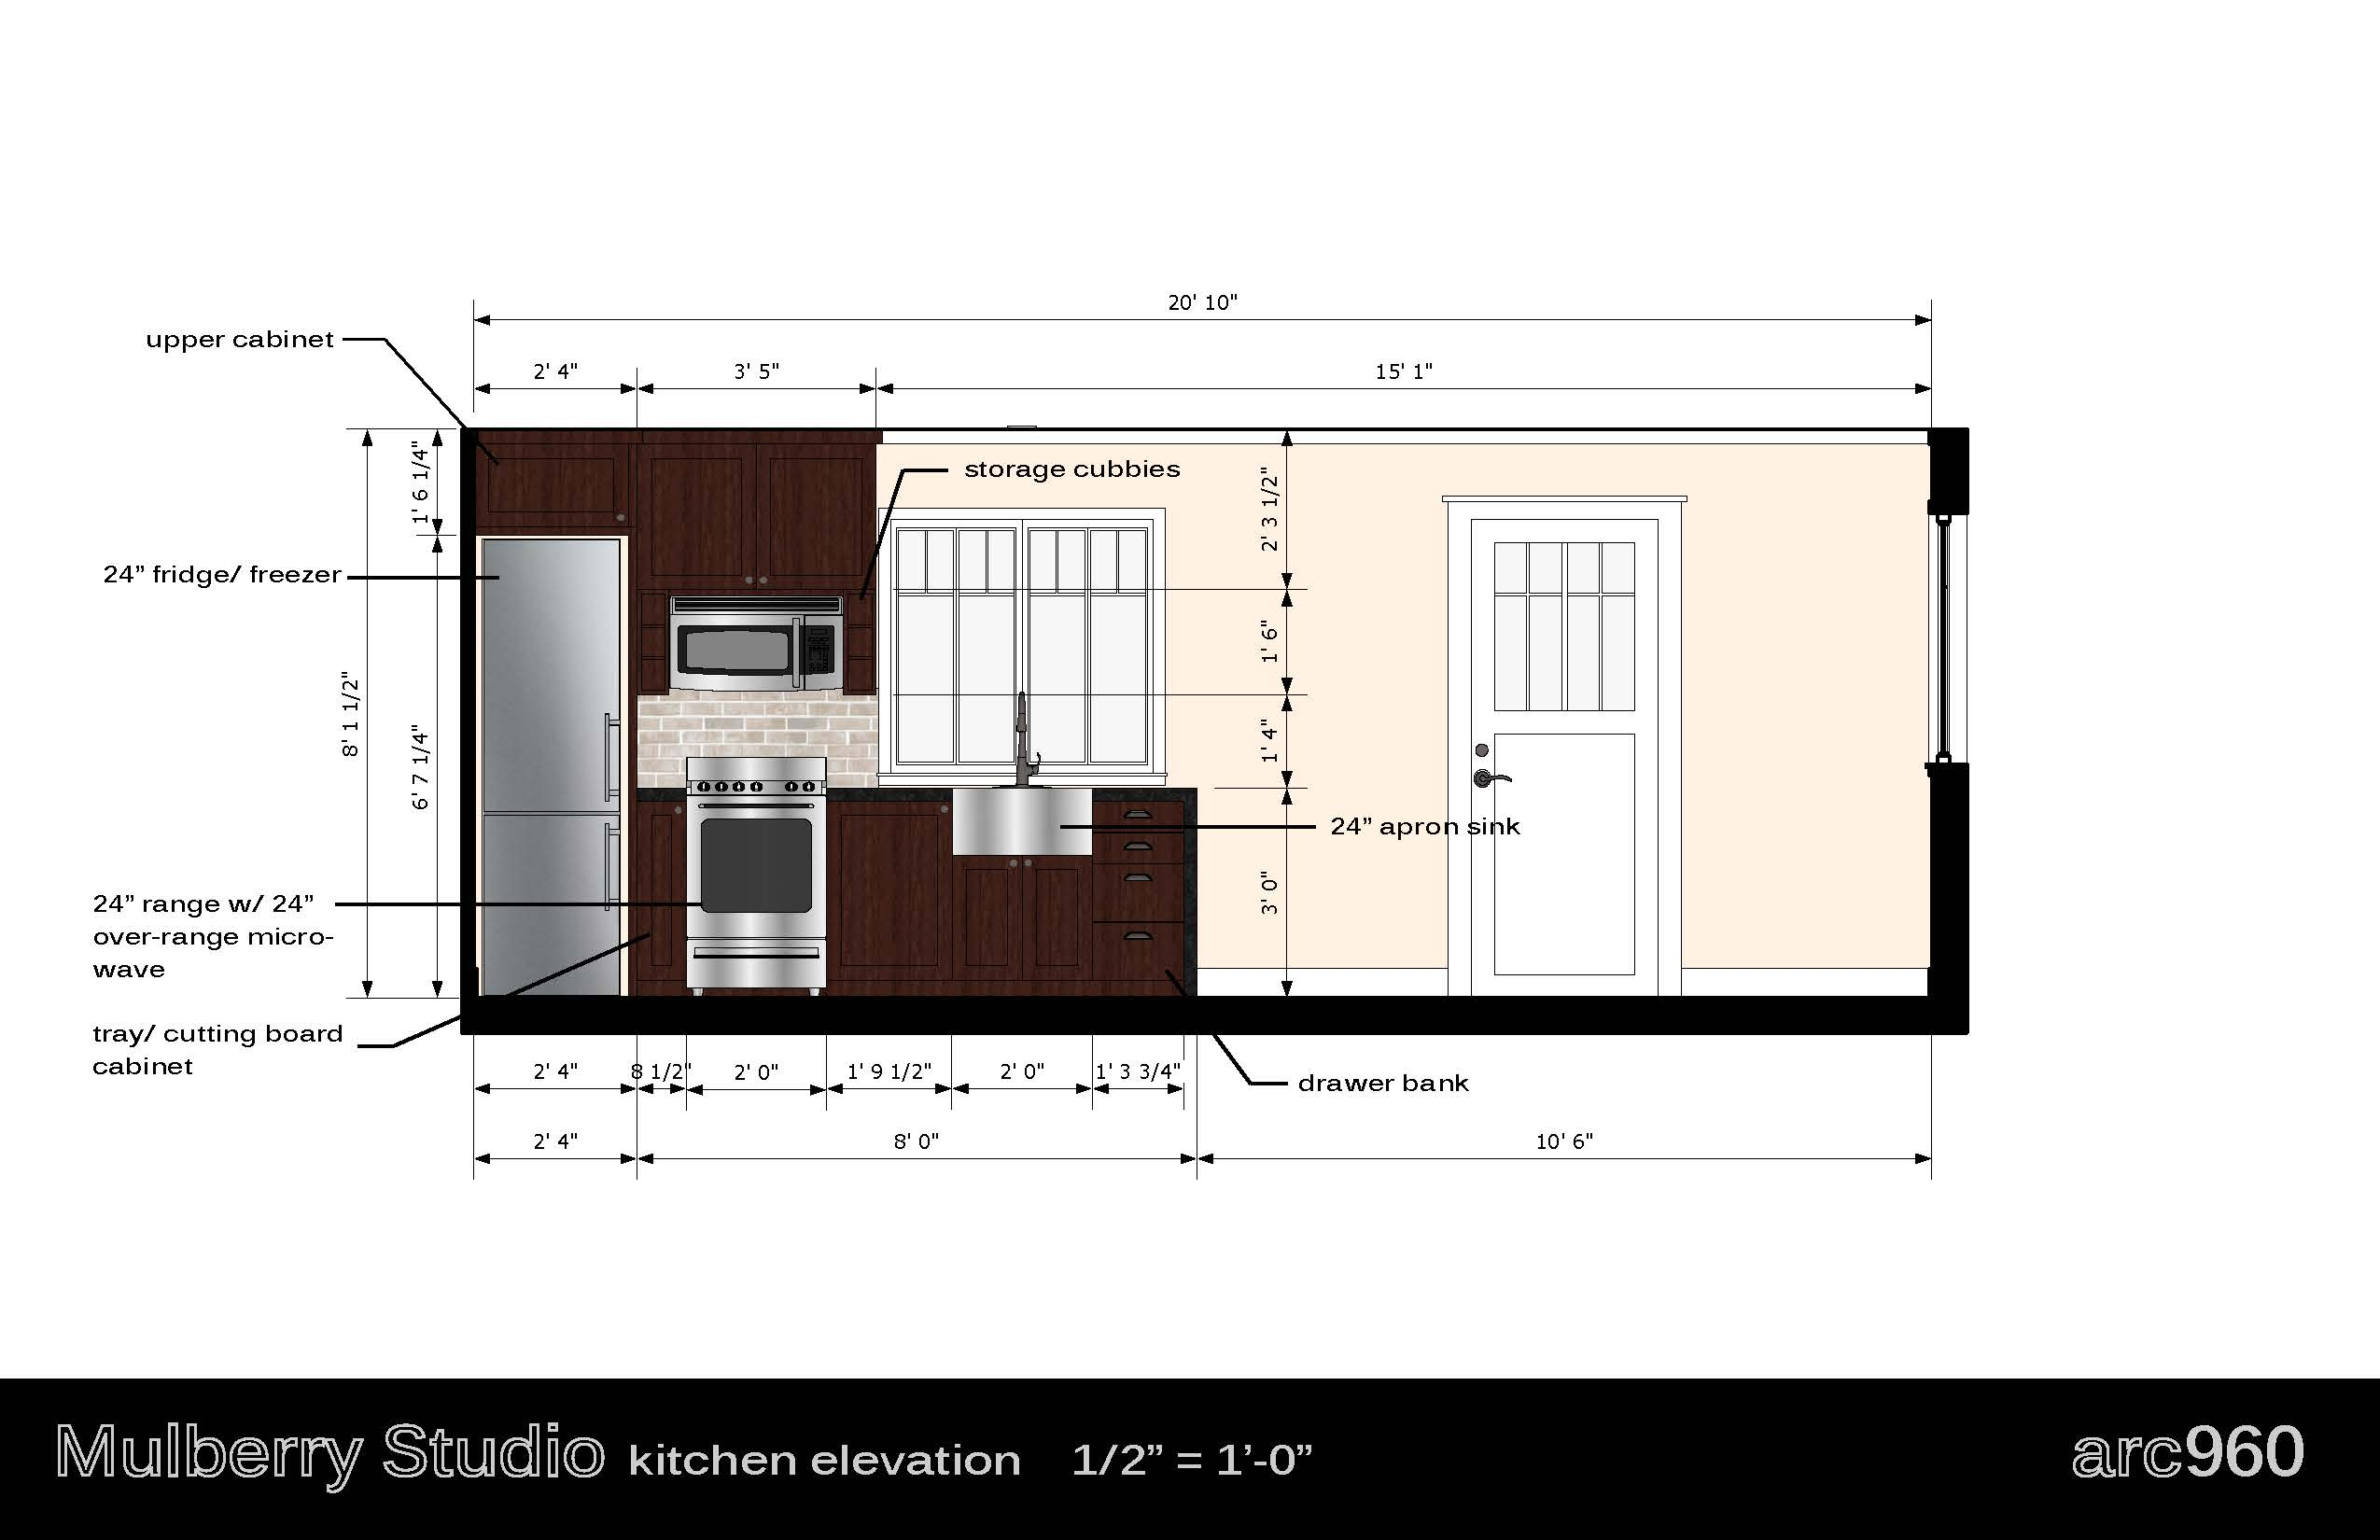 300 Sq Ft Studio 28 Images 300 Square Foot Micro